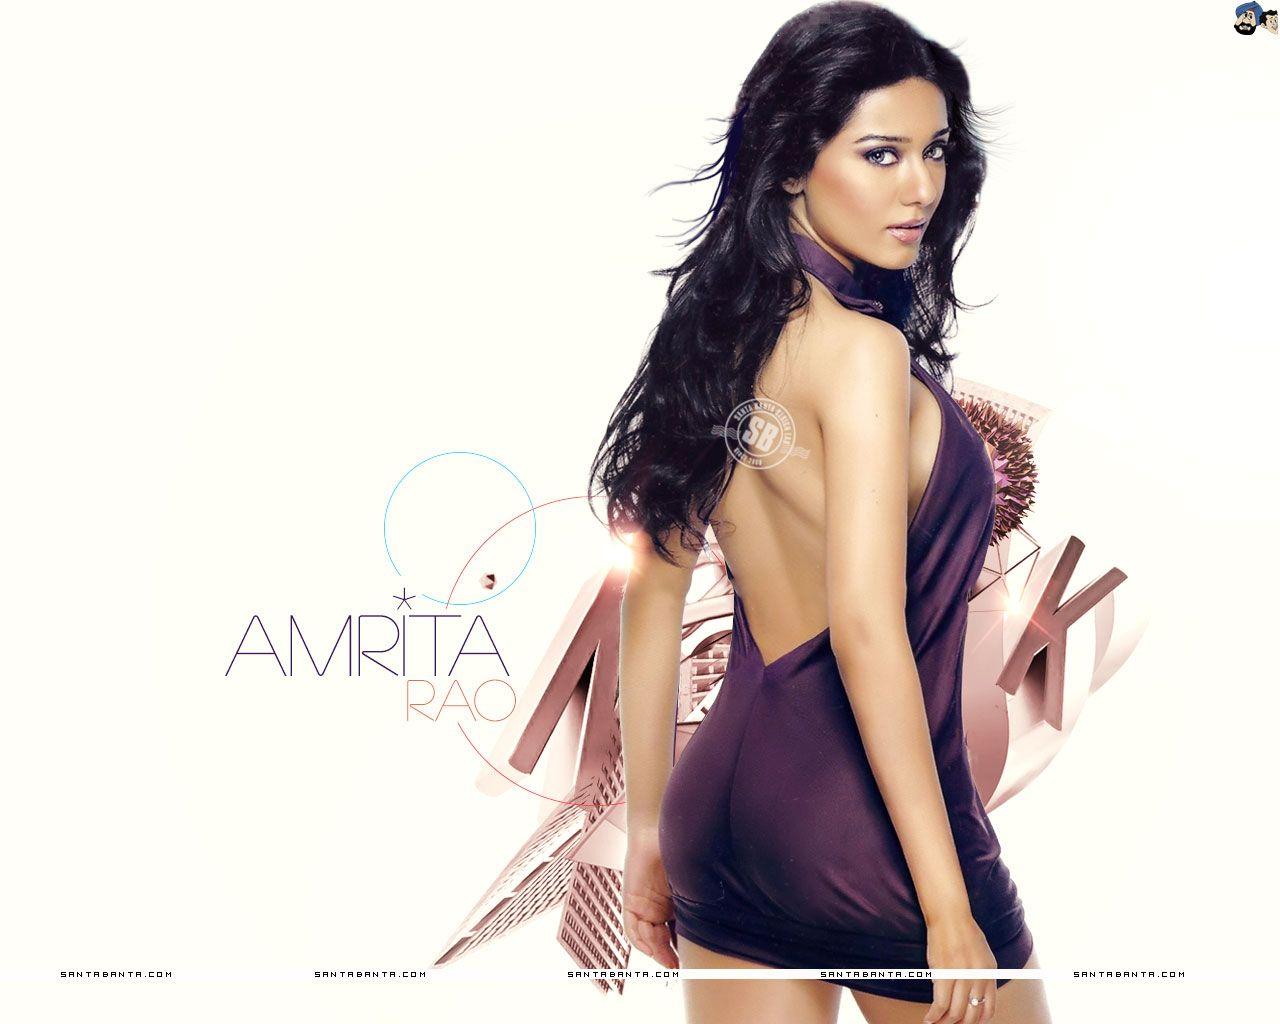 Amrita Rao Hot Photoshoot Indian Actors - YouTube